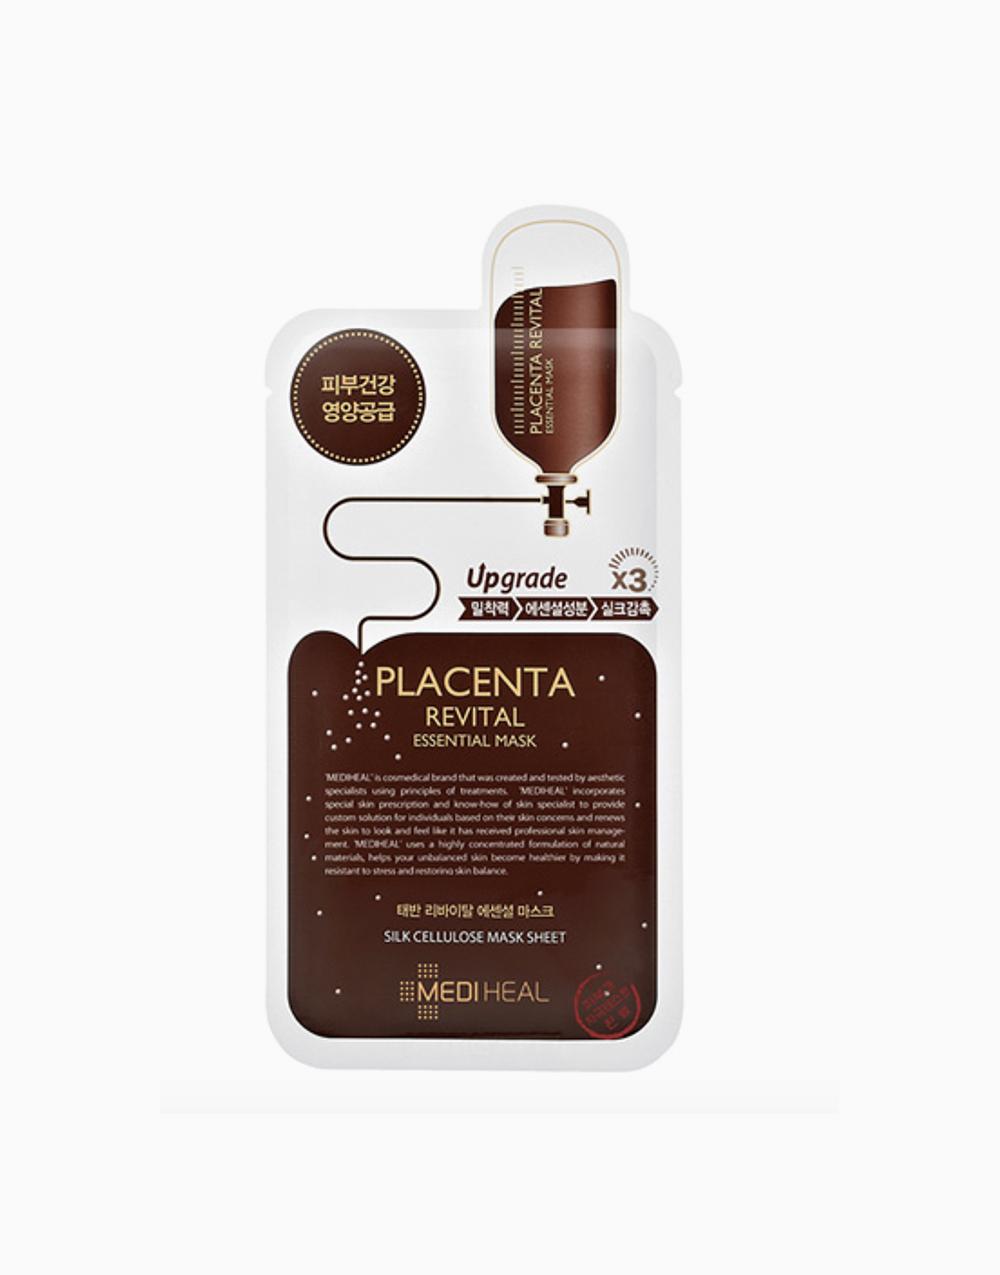 Placenta Revital Firming Essential Mask EX (24ml) by Mediheal